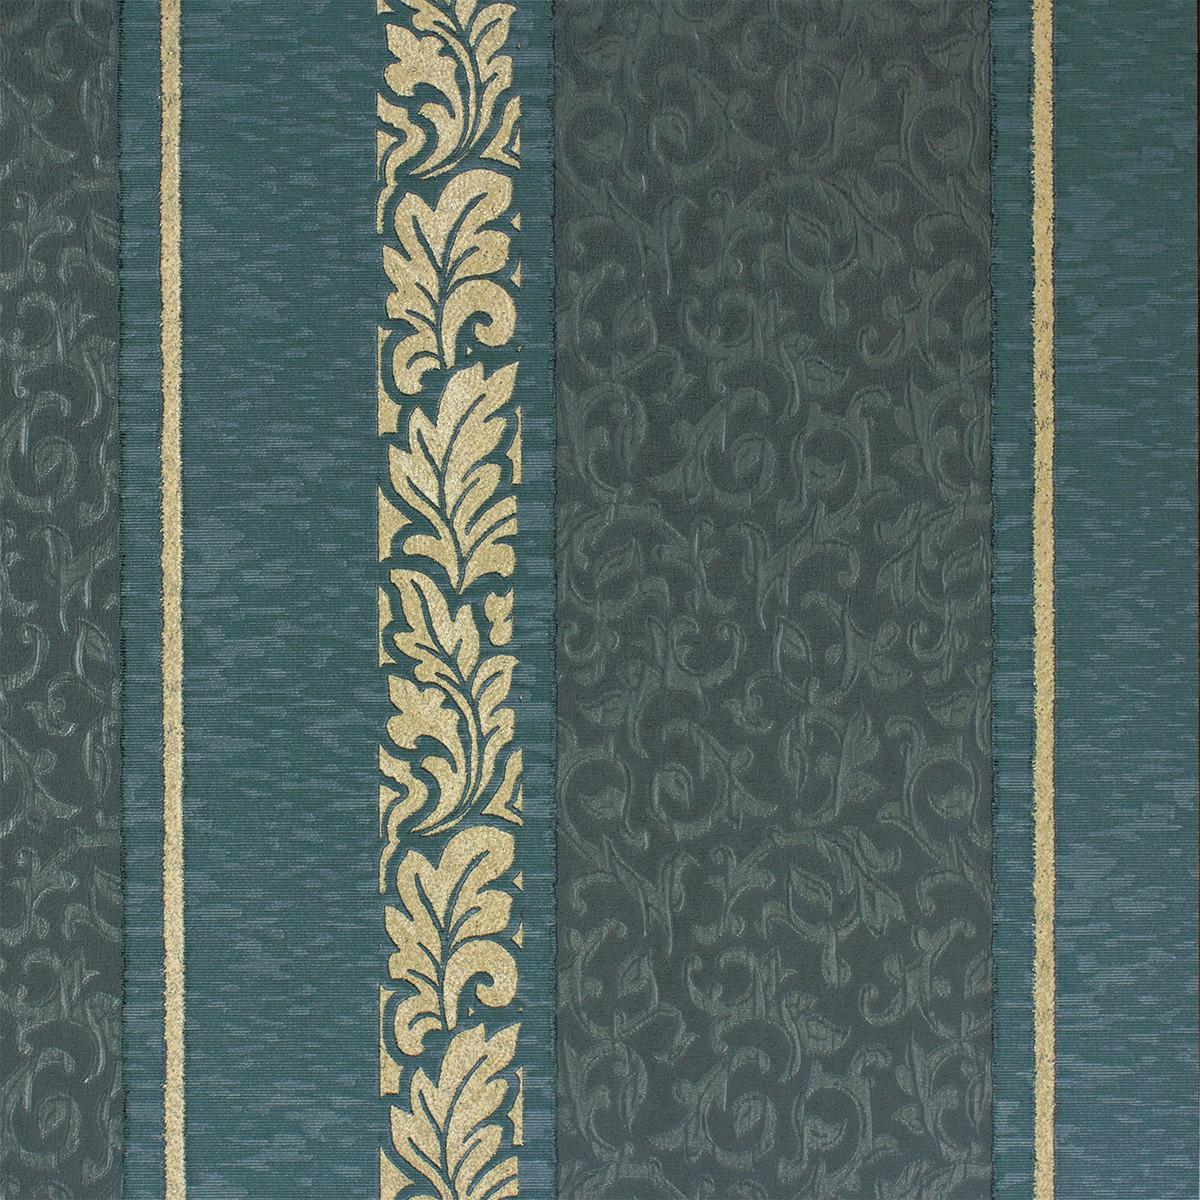 tapete streifen barock t rkis creme tapeten rasch textil. Black Bedroom Furniture Sets. Home Design Ideas